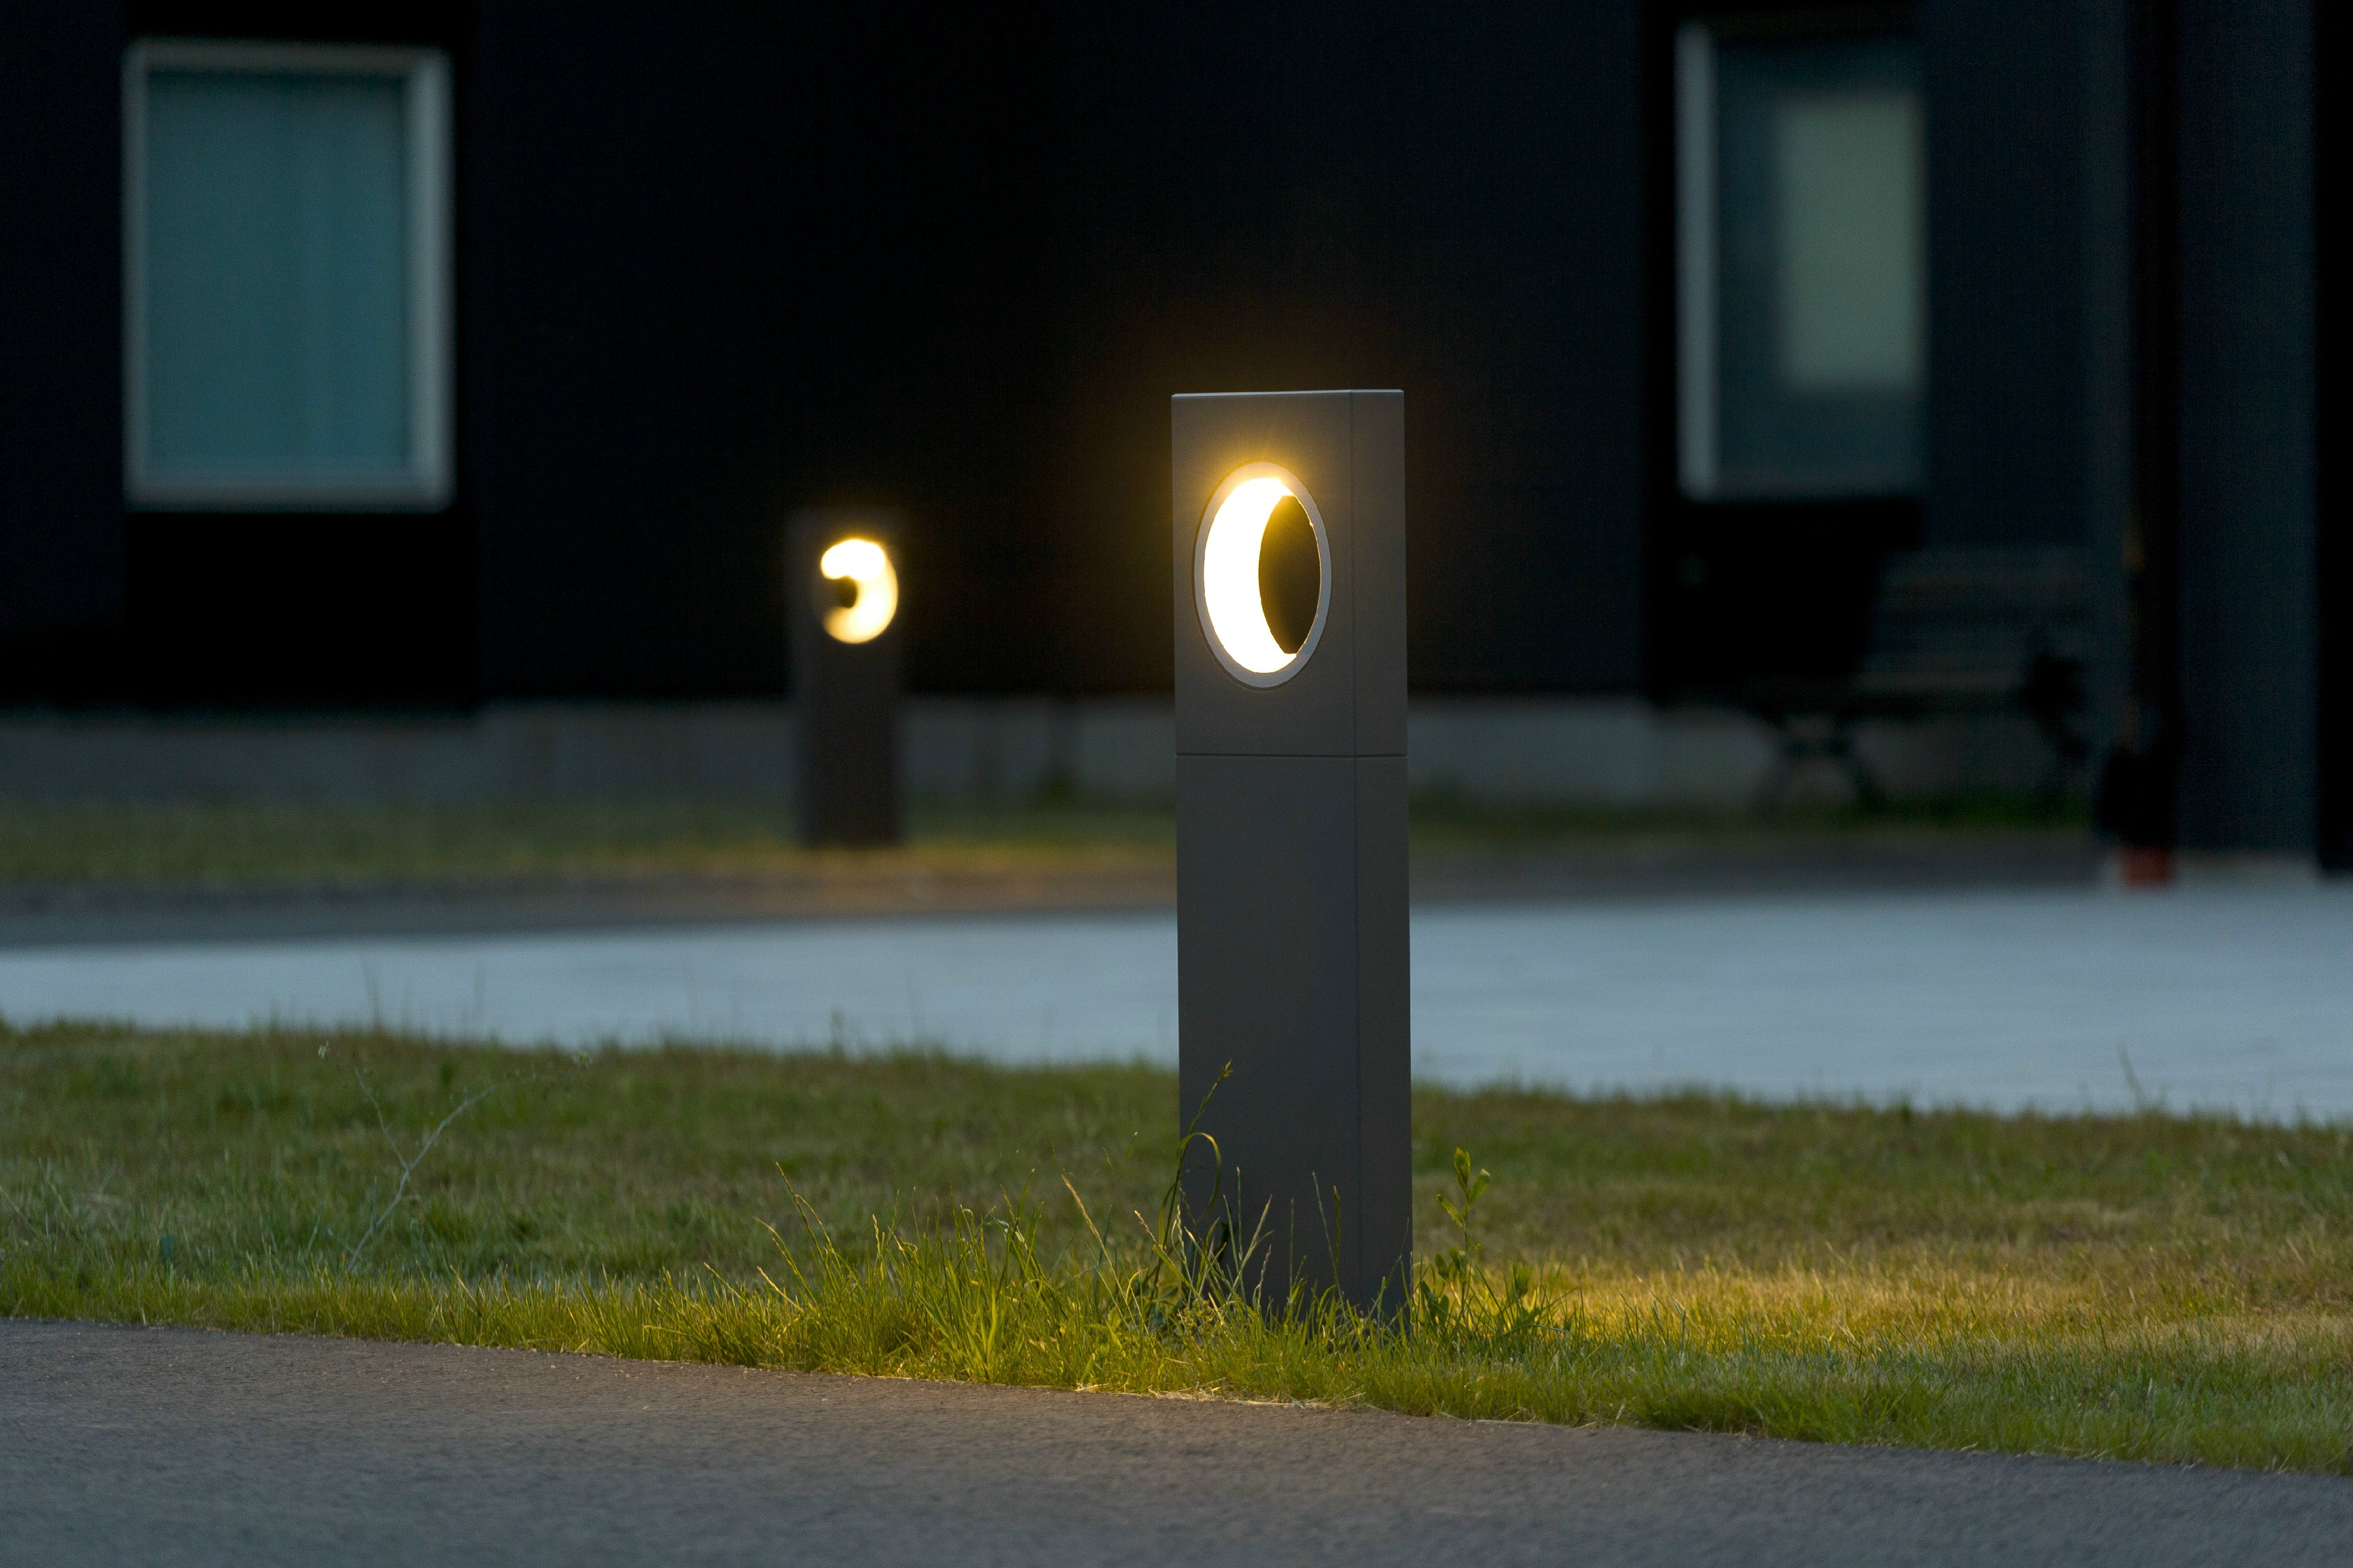 Paletti illuminazione giardino led pali luce da giardino pali